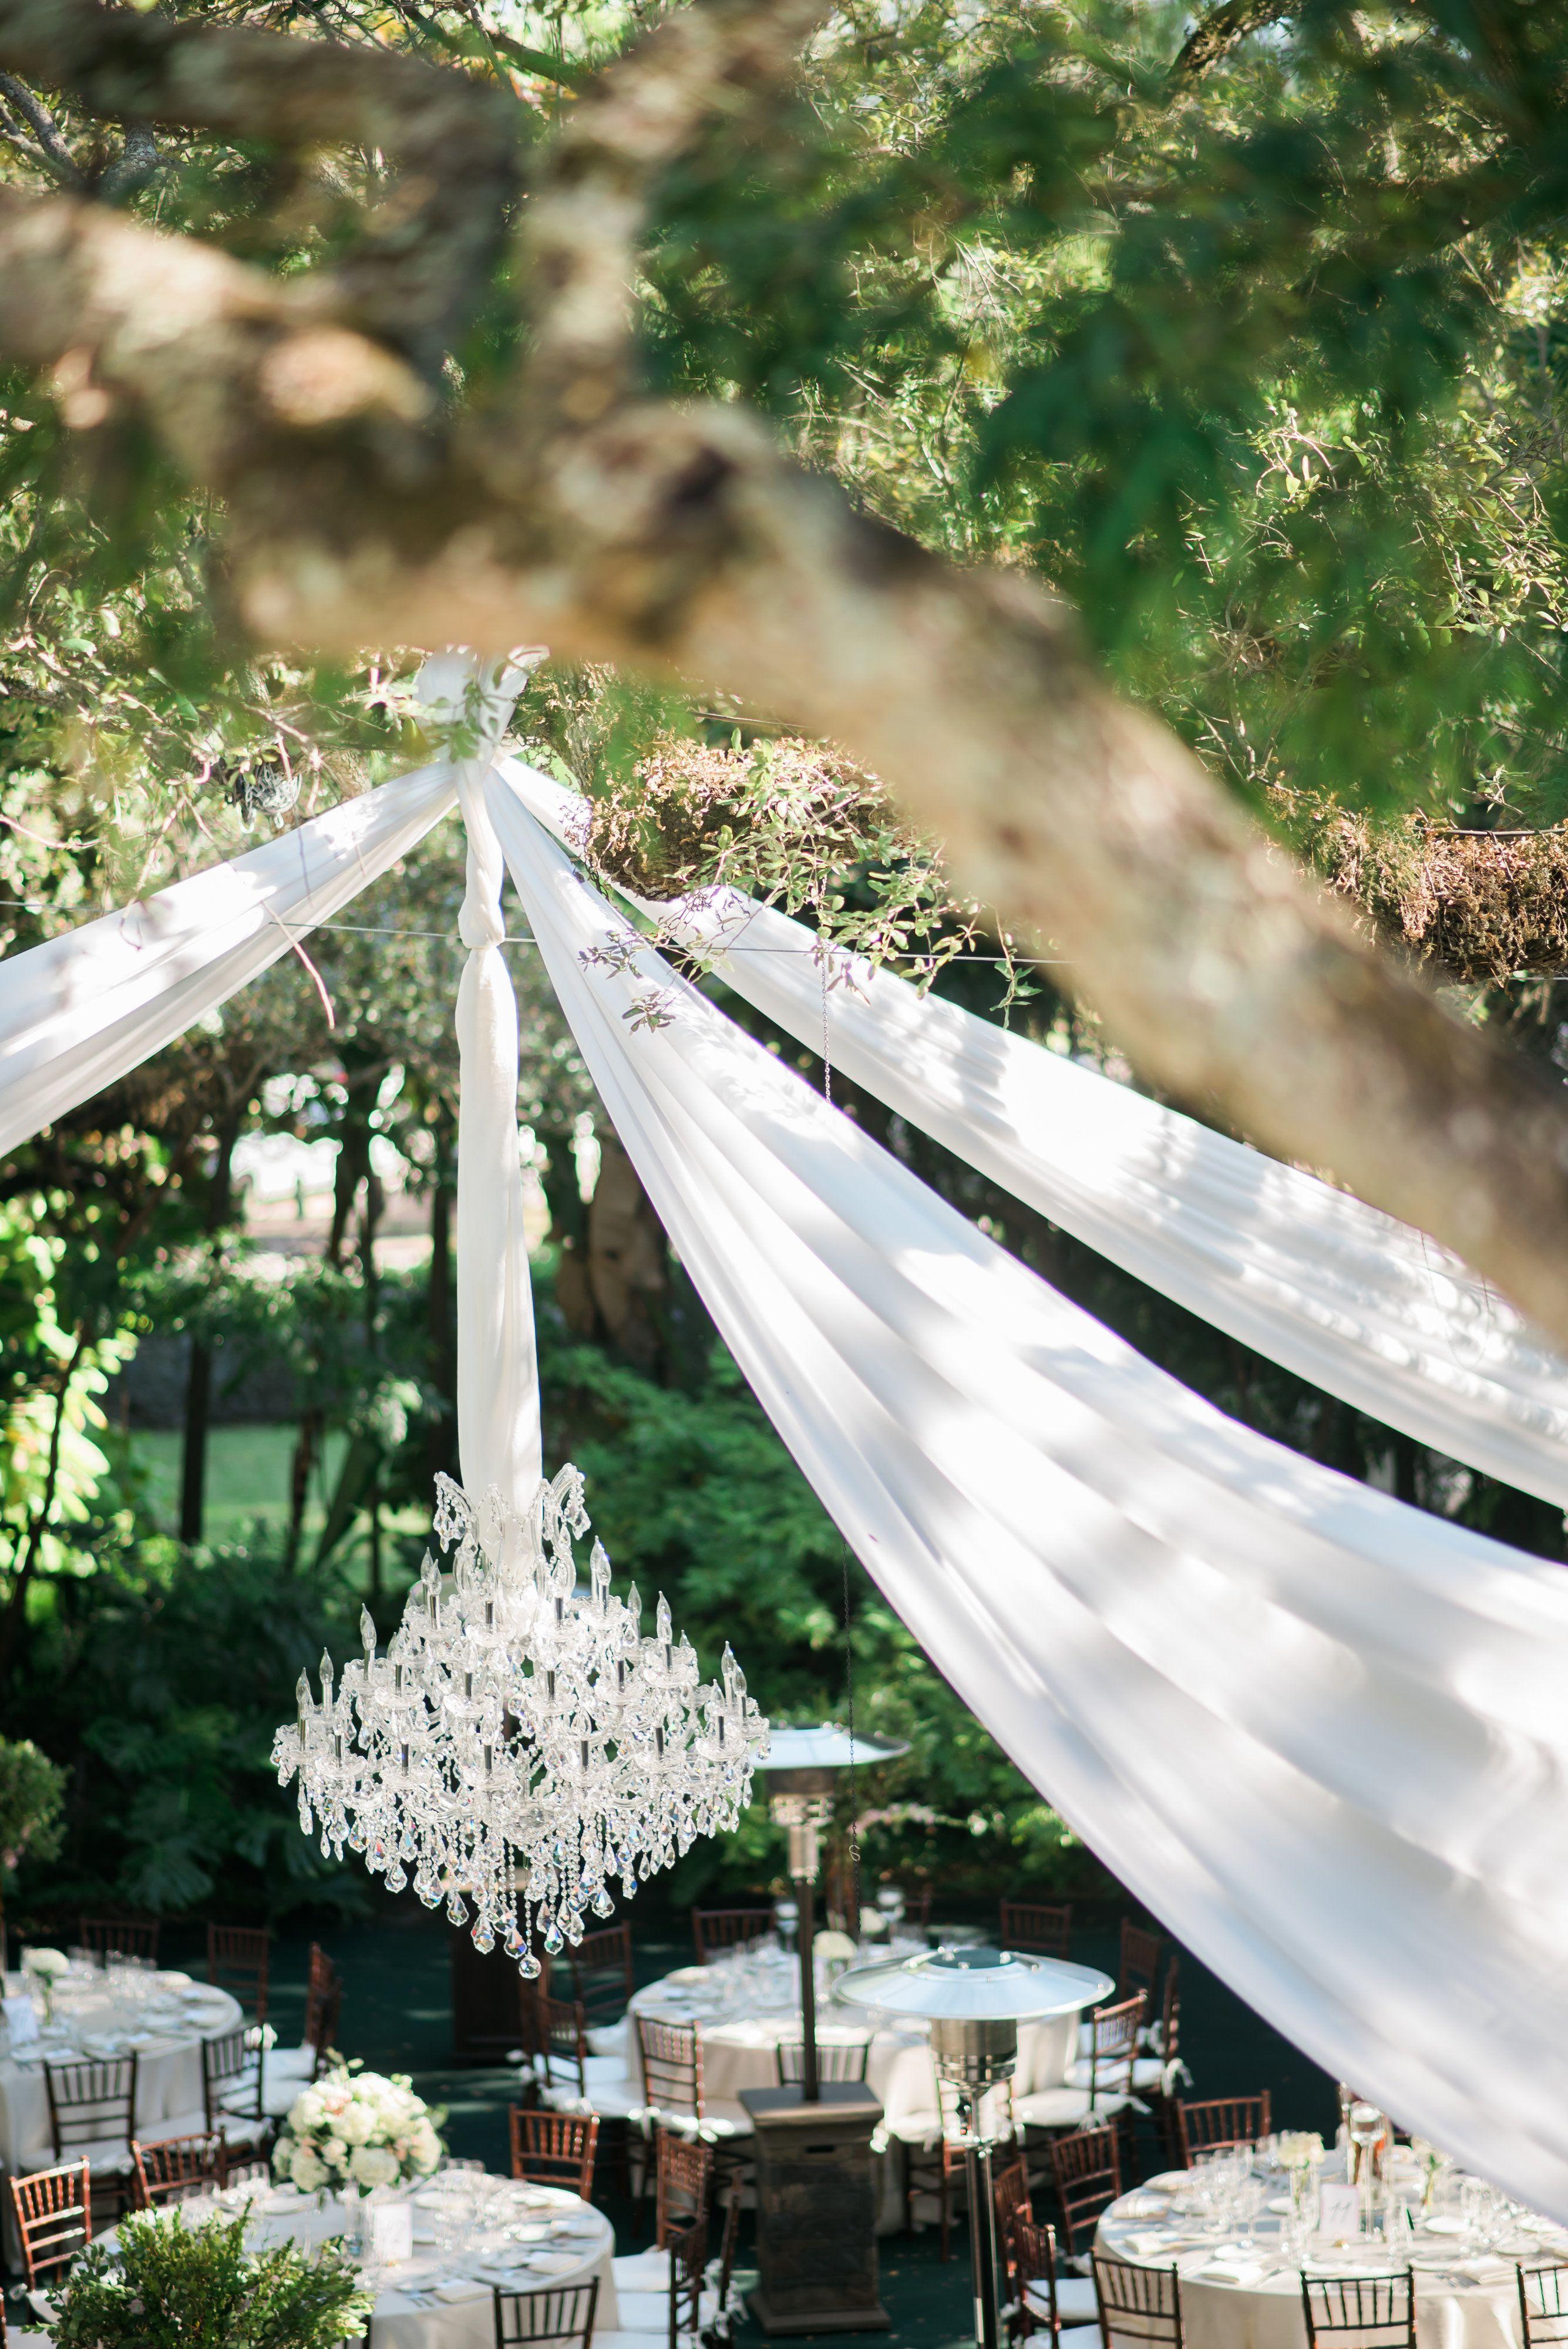 Outdoor Reception with Chandelier | Miami Wedding | Venue Villa Woodbine & Outdoor Reception with Chandelier | Miami Wedding | Venue: Villa ...